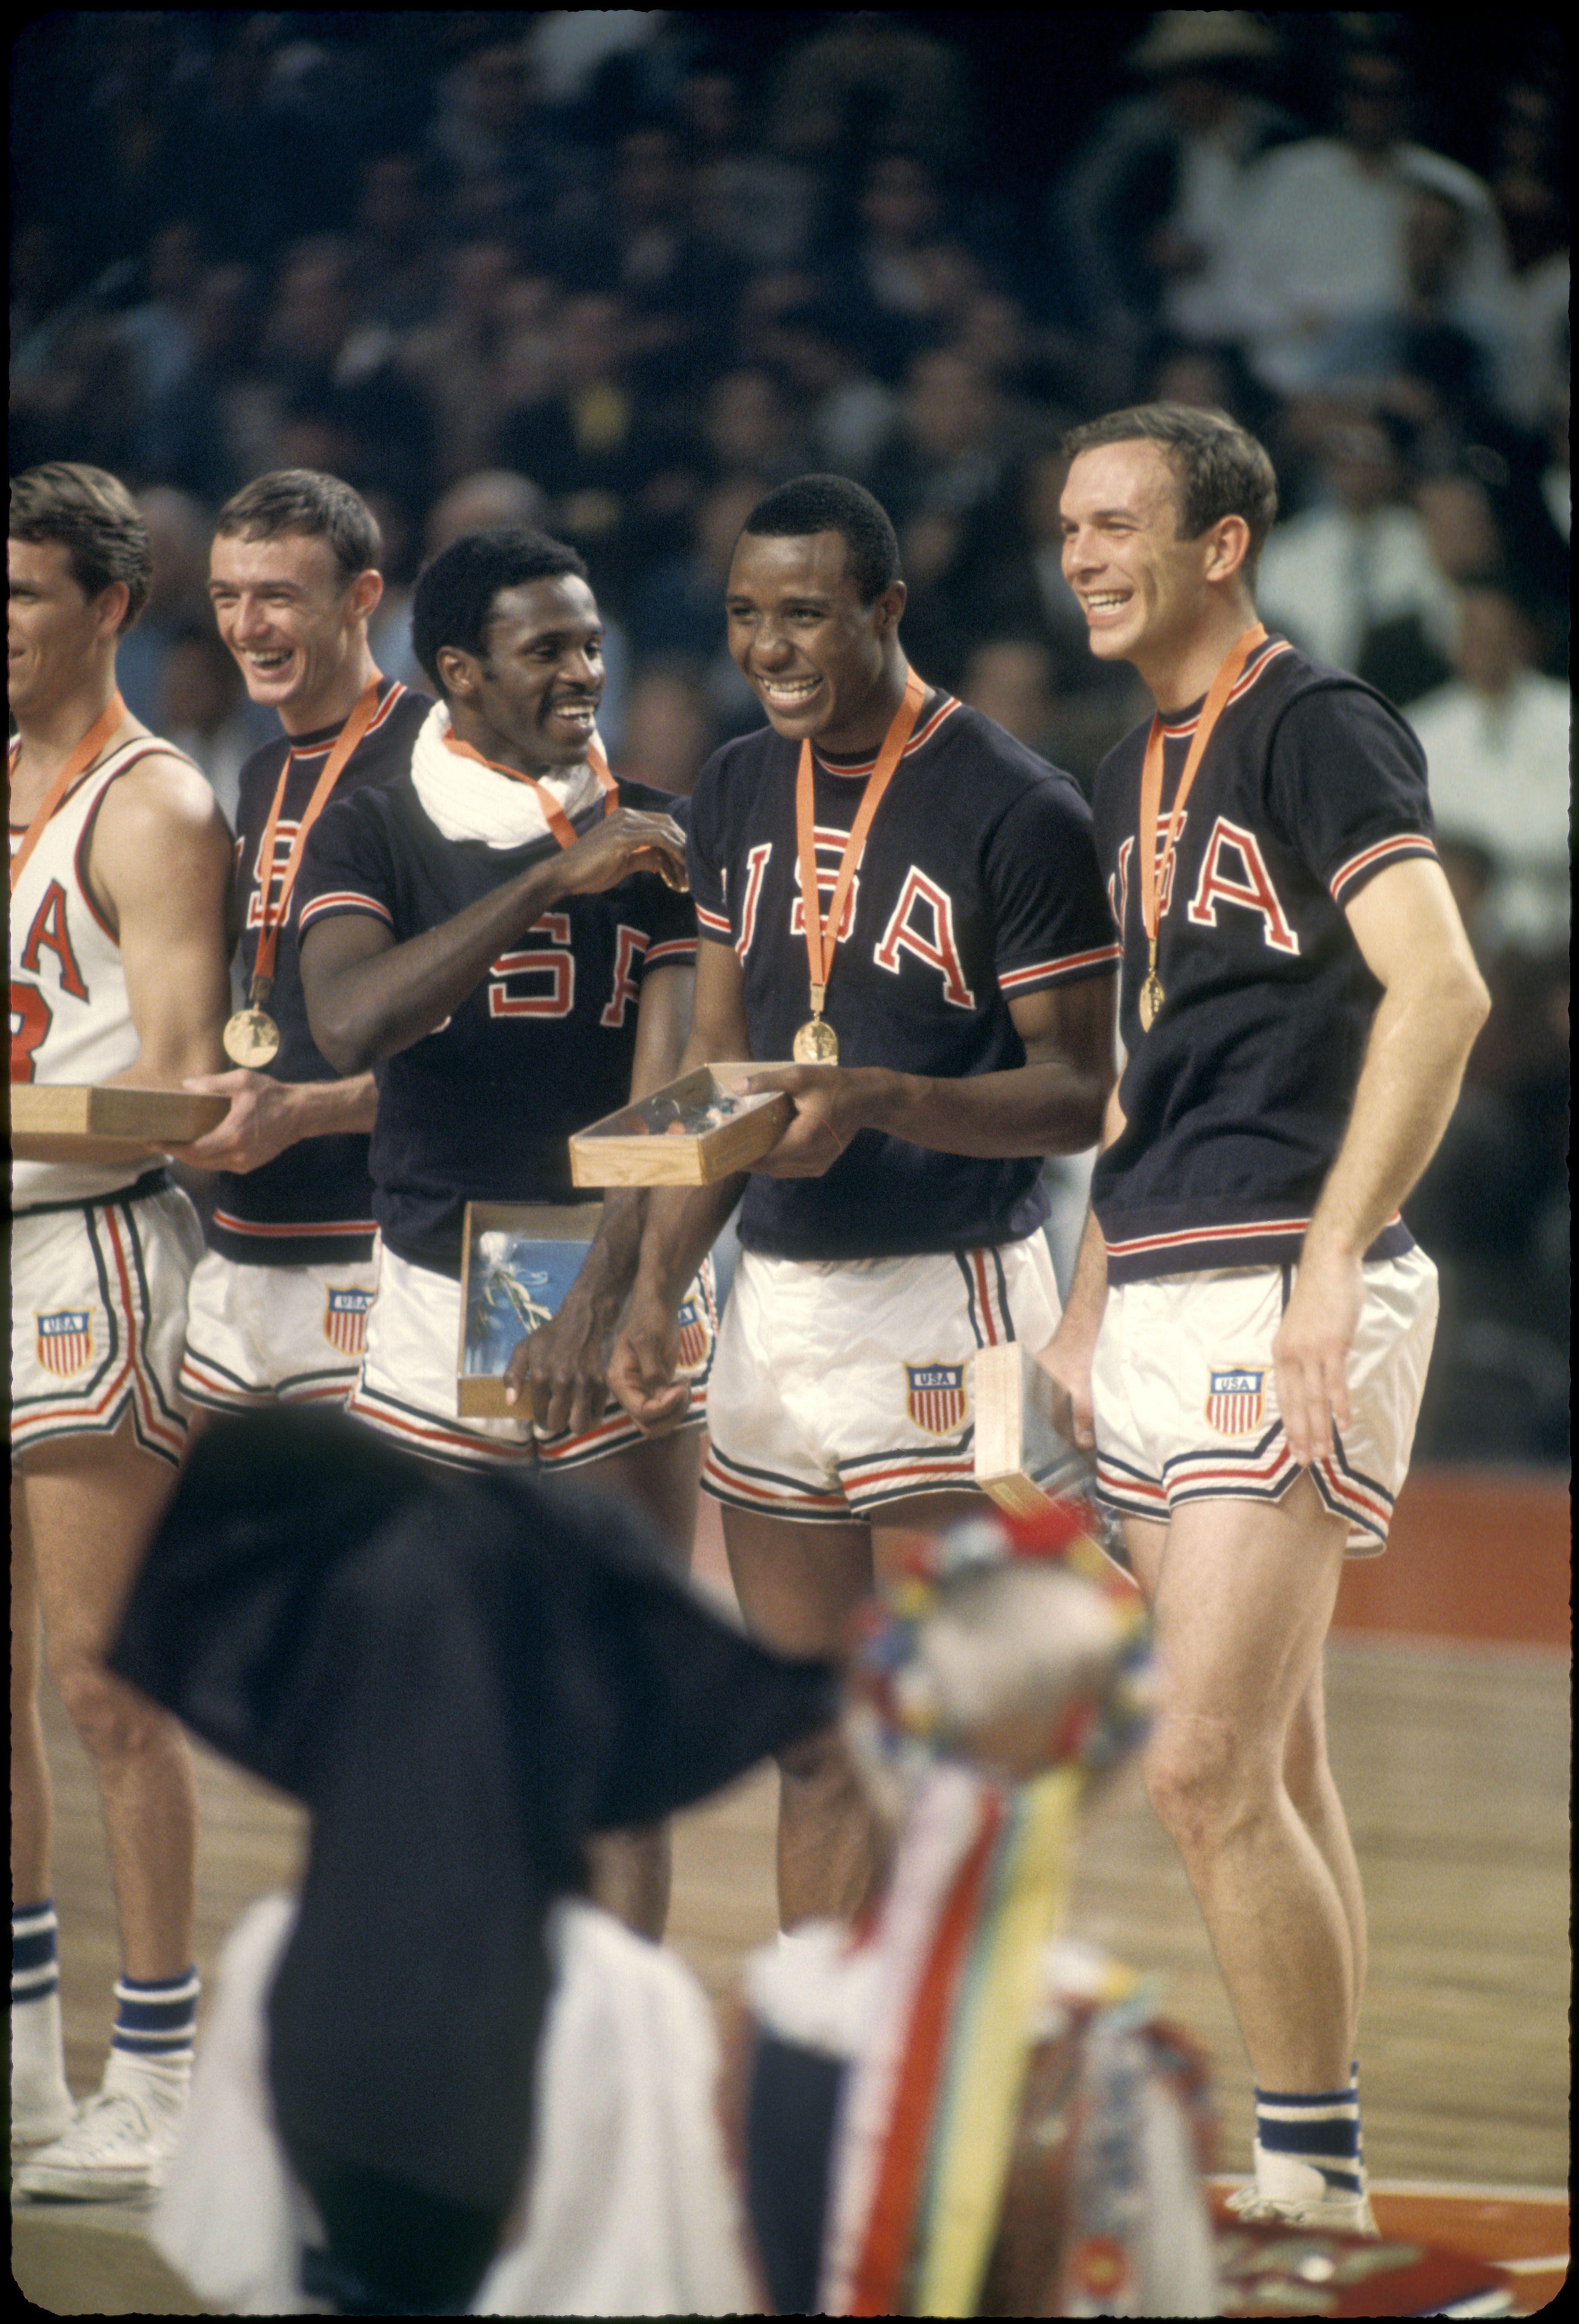 U.S. men's basketball team on the podium